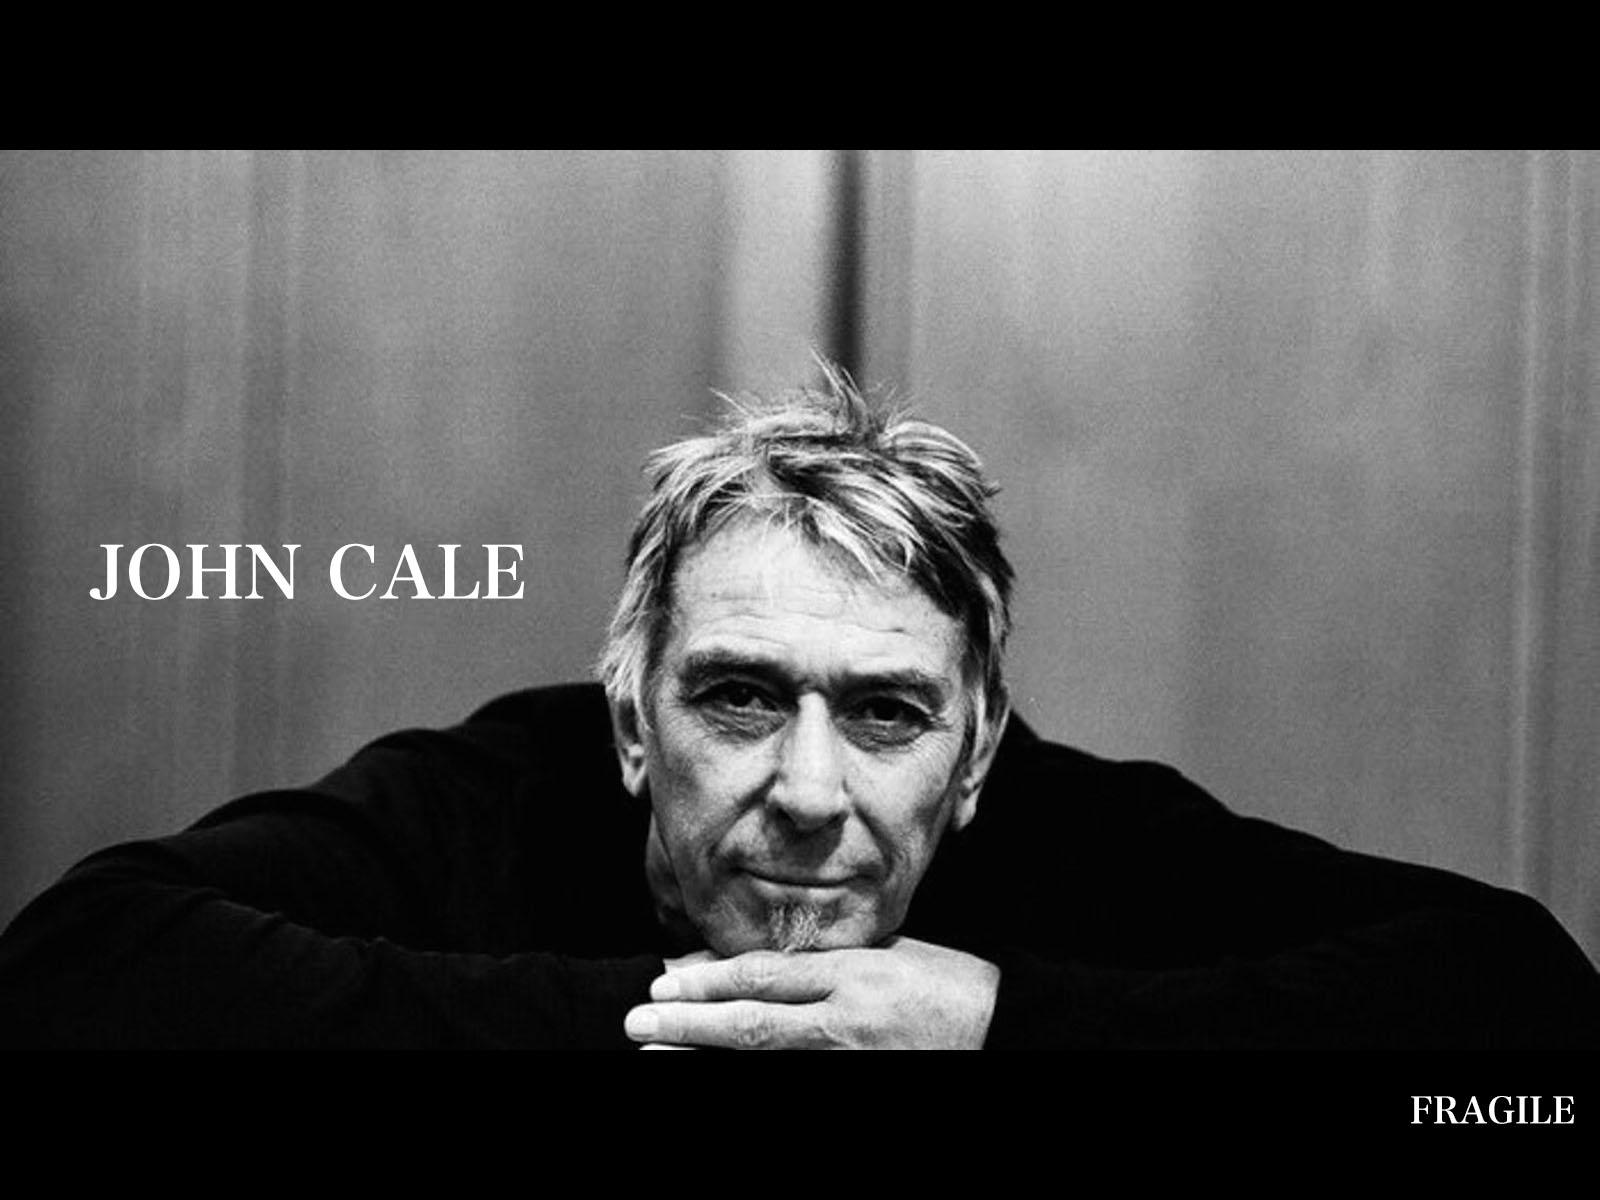 STORY OF JOHN CALE